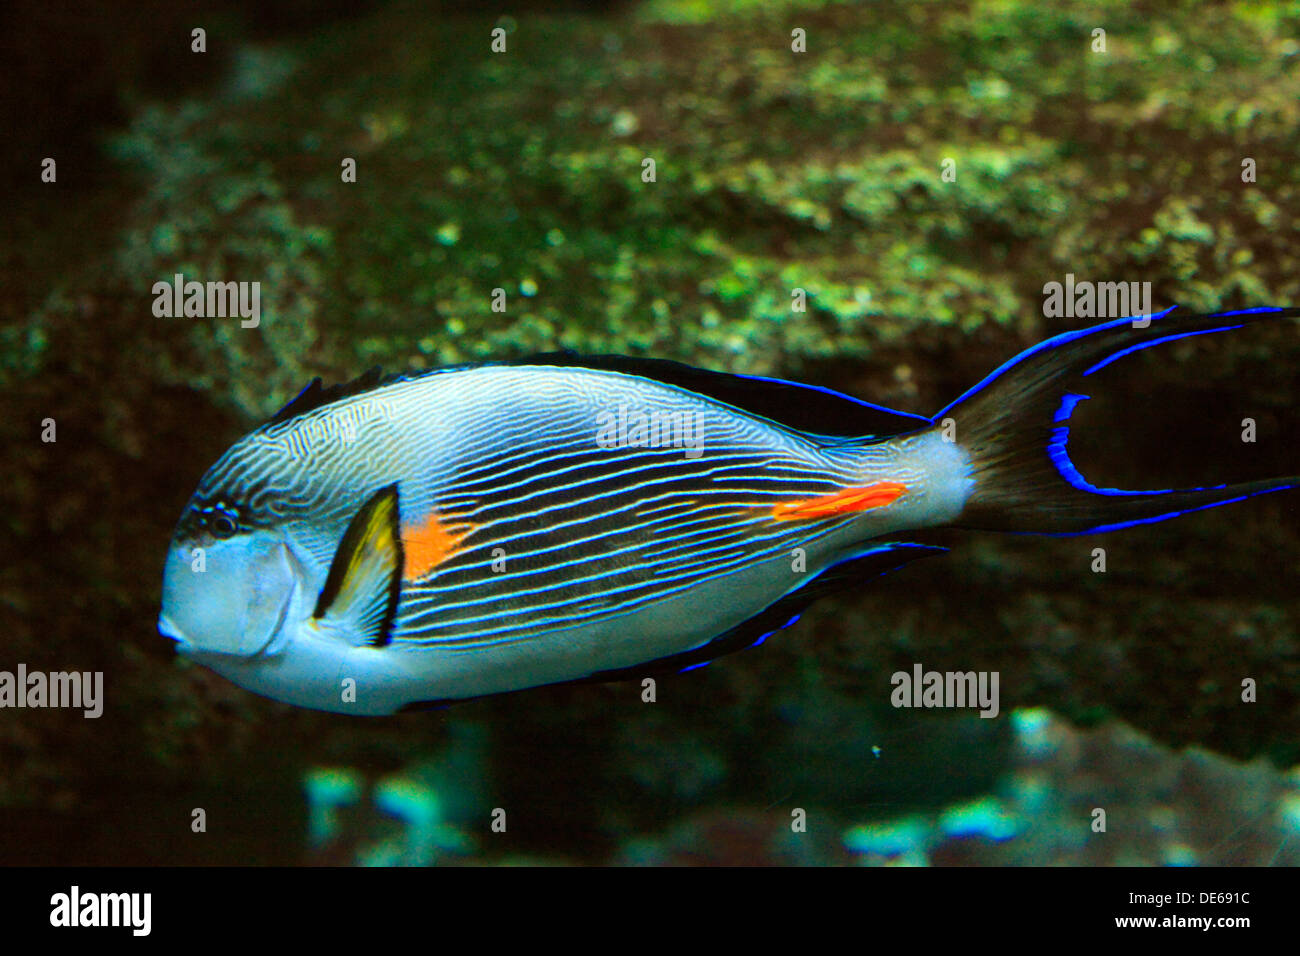 D-Bochum, Ruhr area, Westphalia, North Rhine-Westphalia, NRW, Tierpark and Fossilium Bochum, sohal surgeonfish, sohal tang, Acanthurus sohal - Stock Image